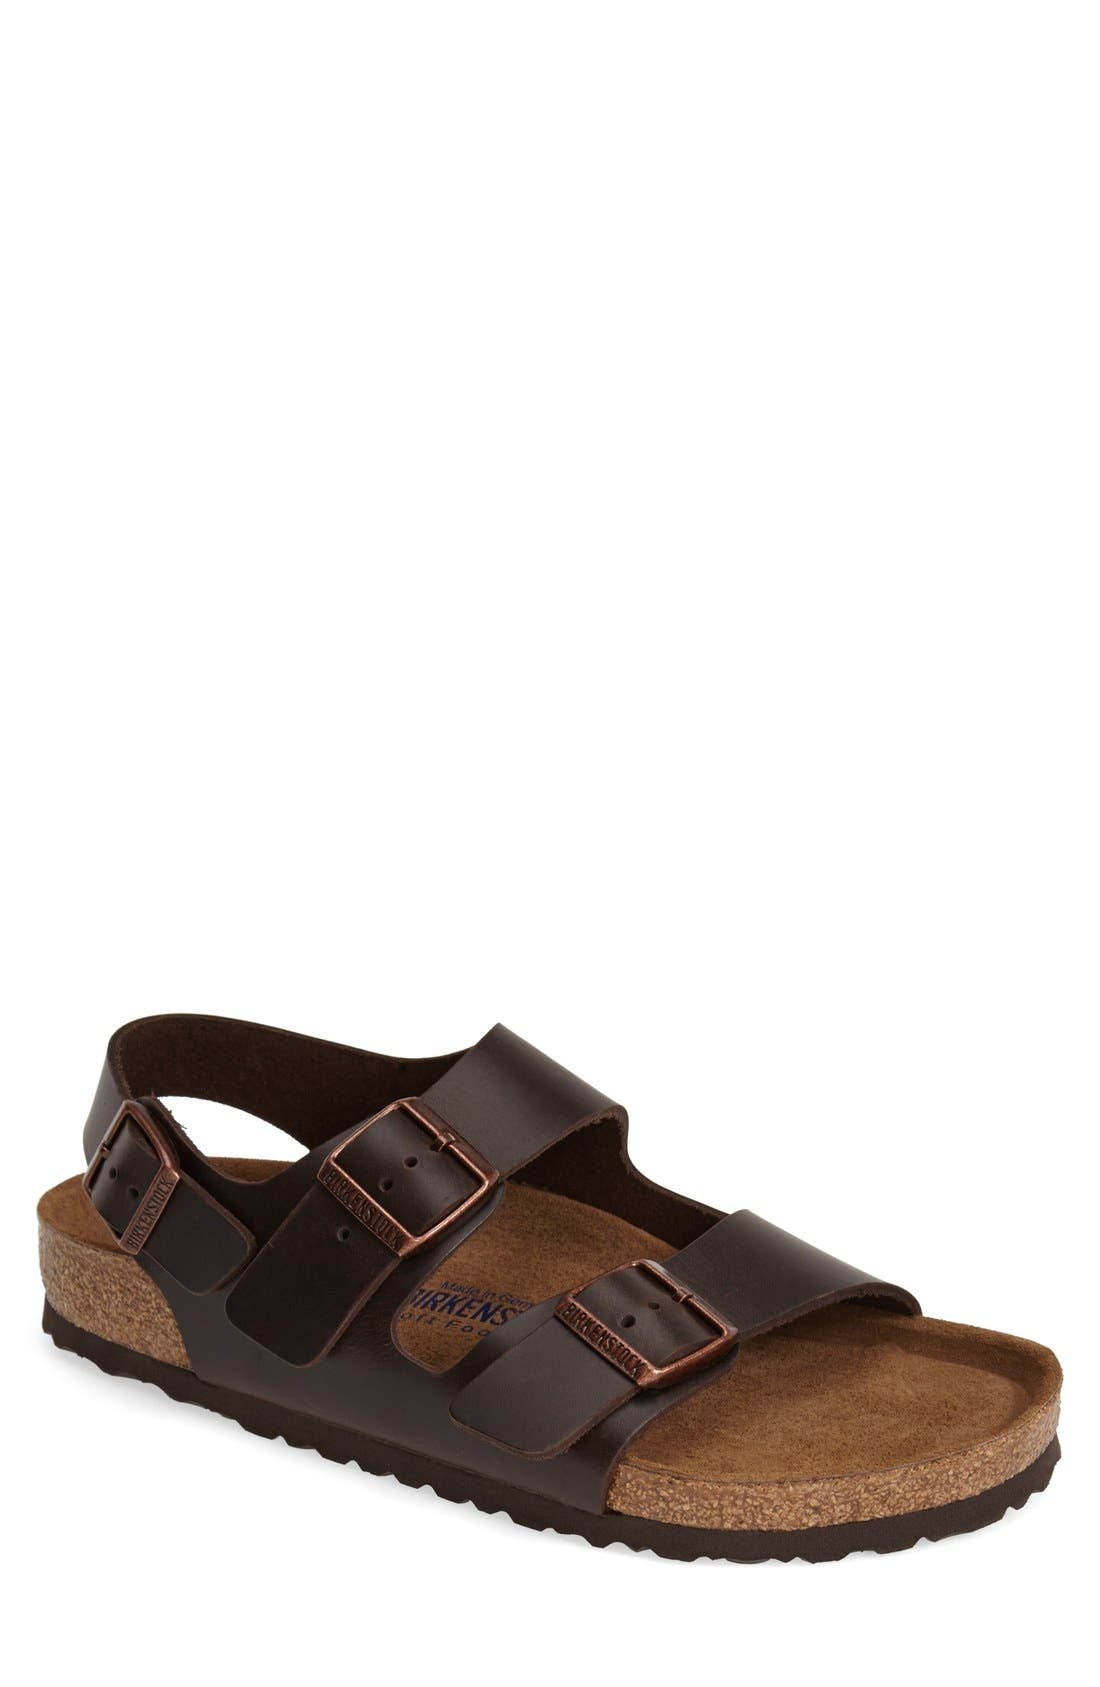 BIRKENSTOCK 'Milano' Soft Footbed Sandal, Main, color, AMALFI BROWN